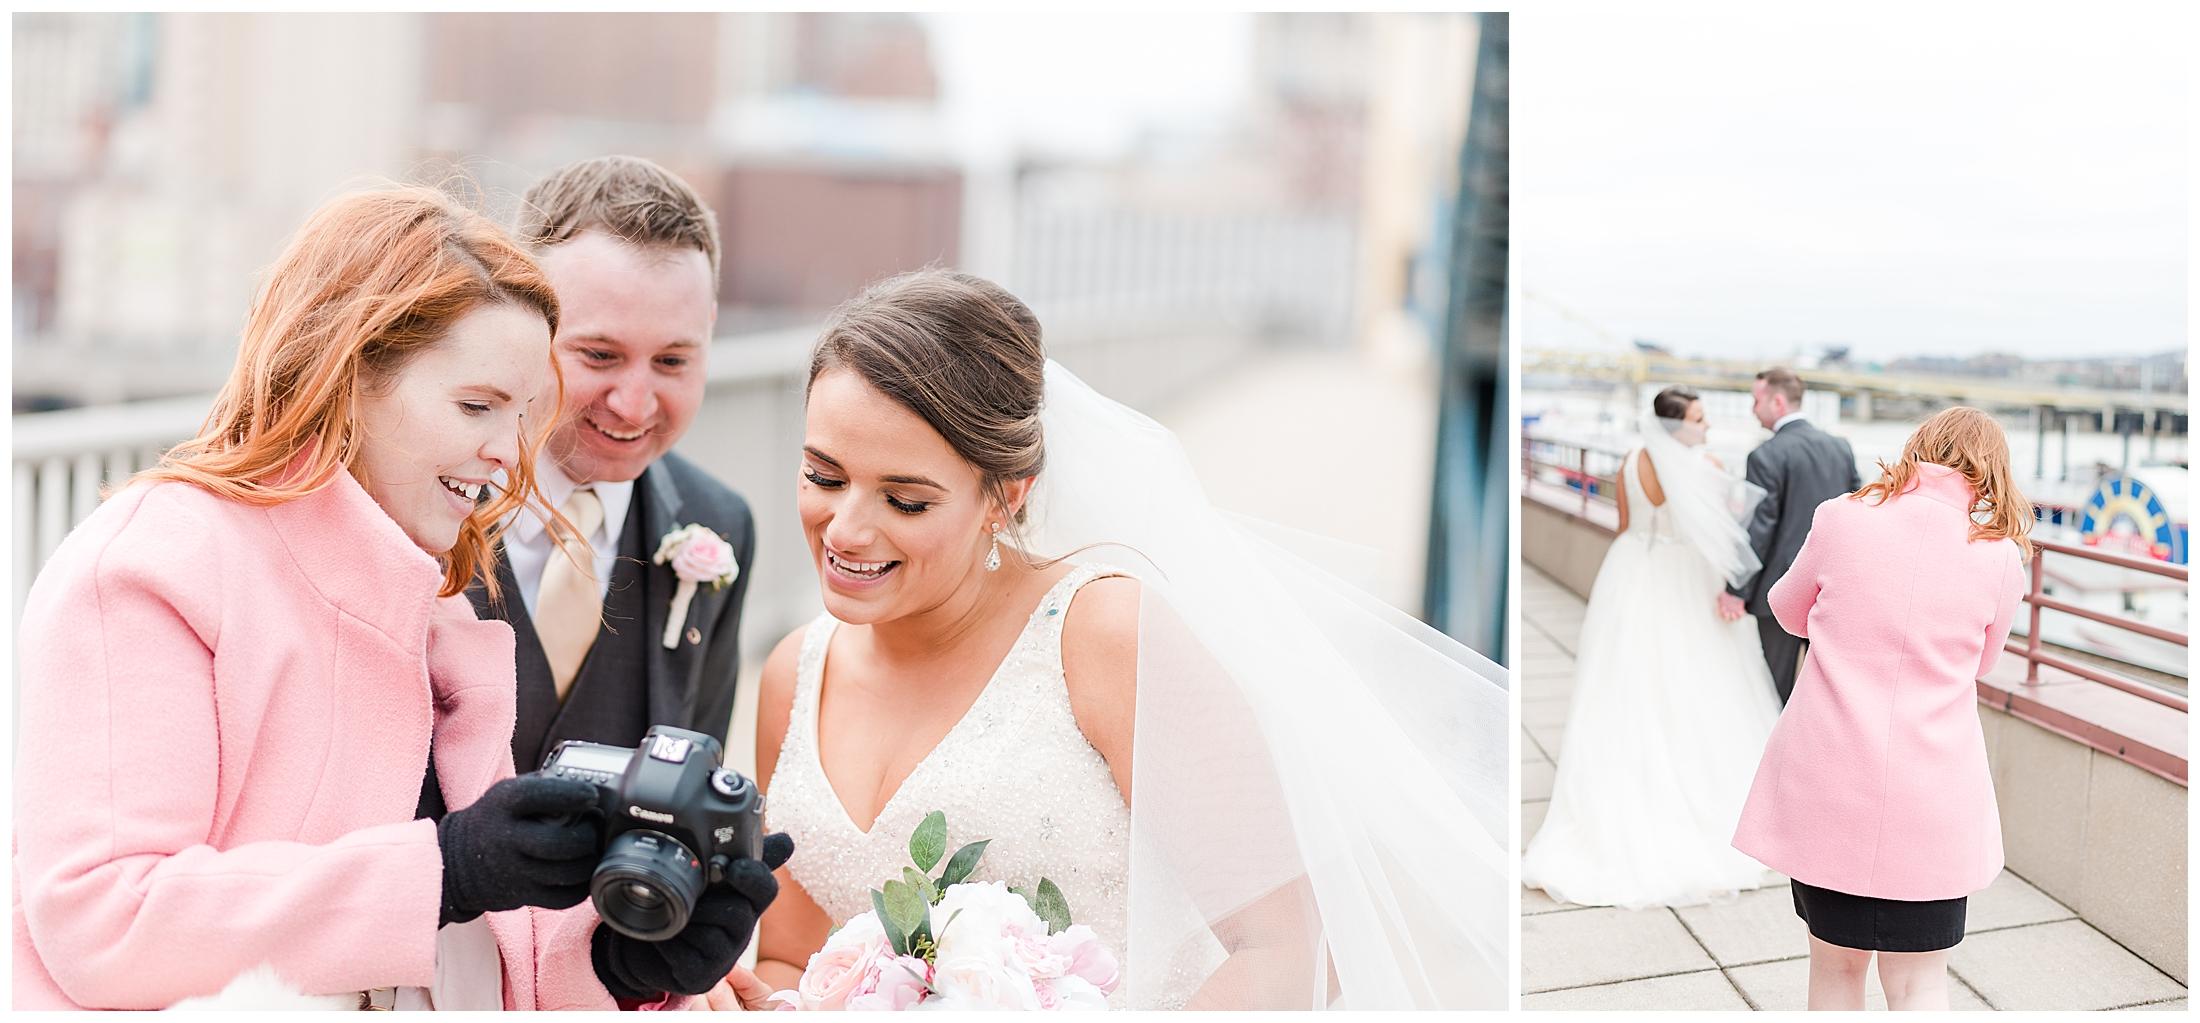 what-i-wear-to-shoot-weddings-1.jpg